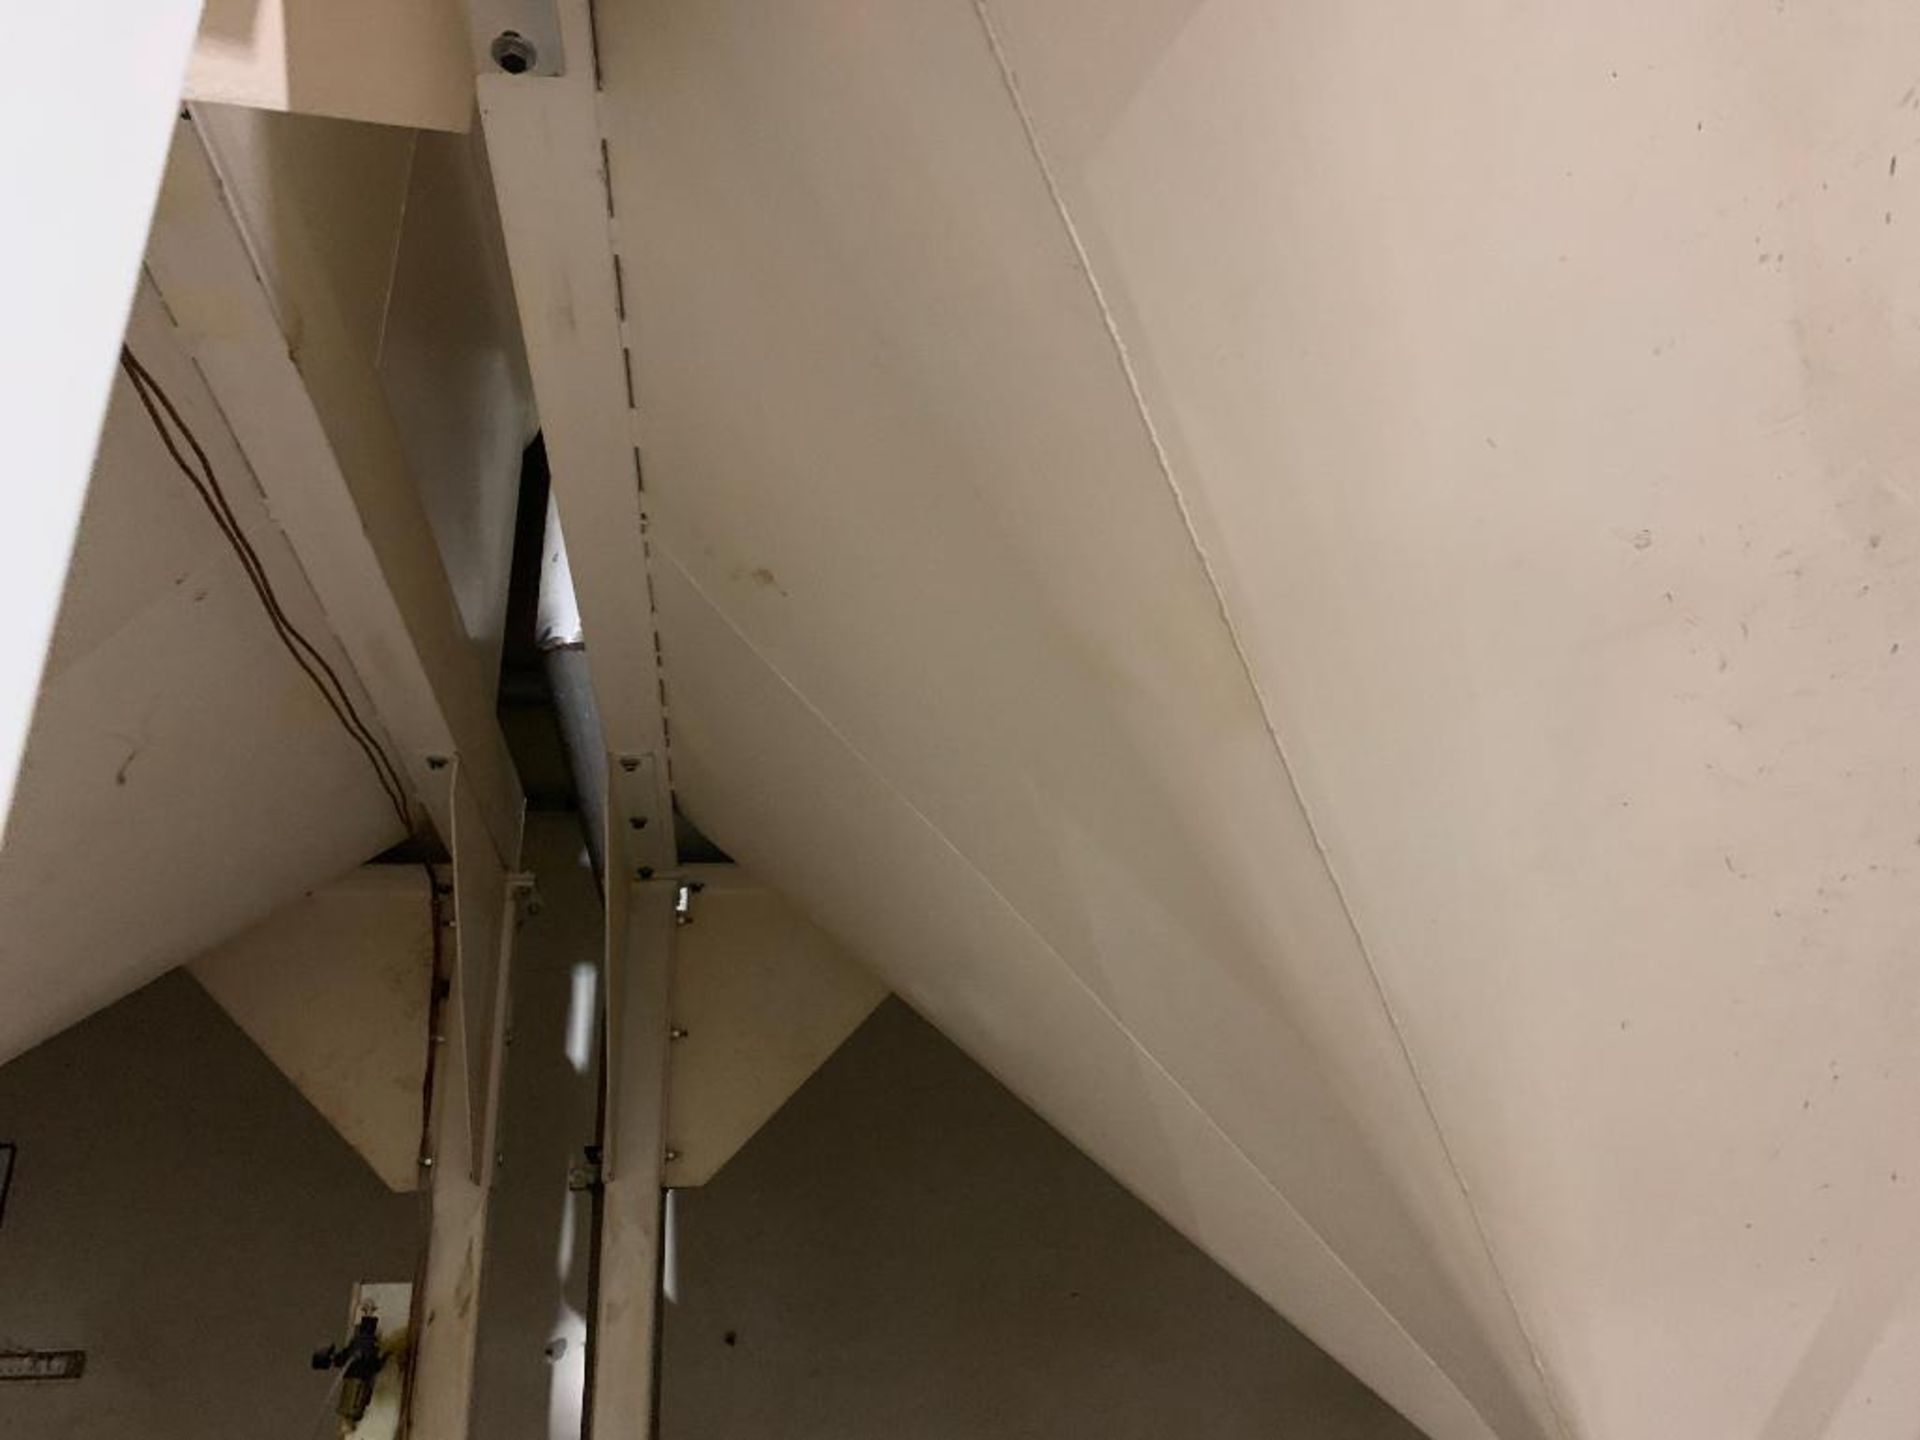 Aseeco mild steel cone bottom bulk storage bin - Image 11 of 27